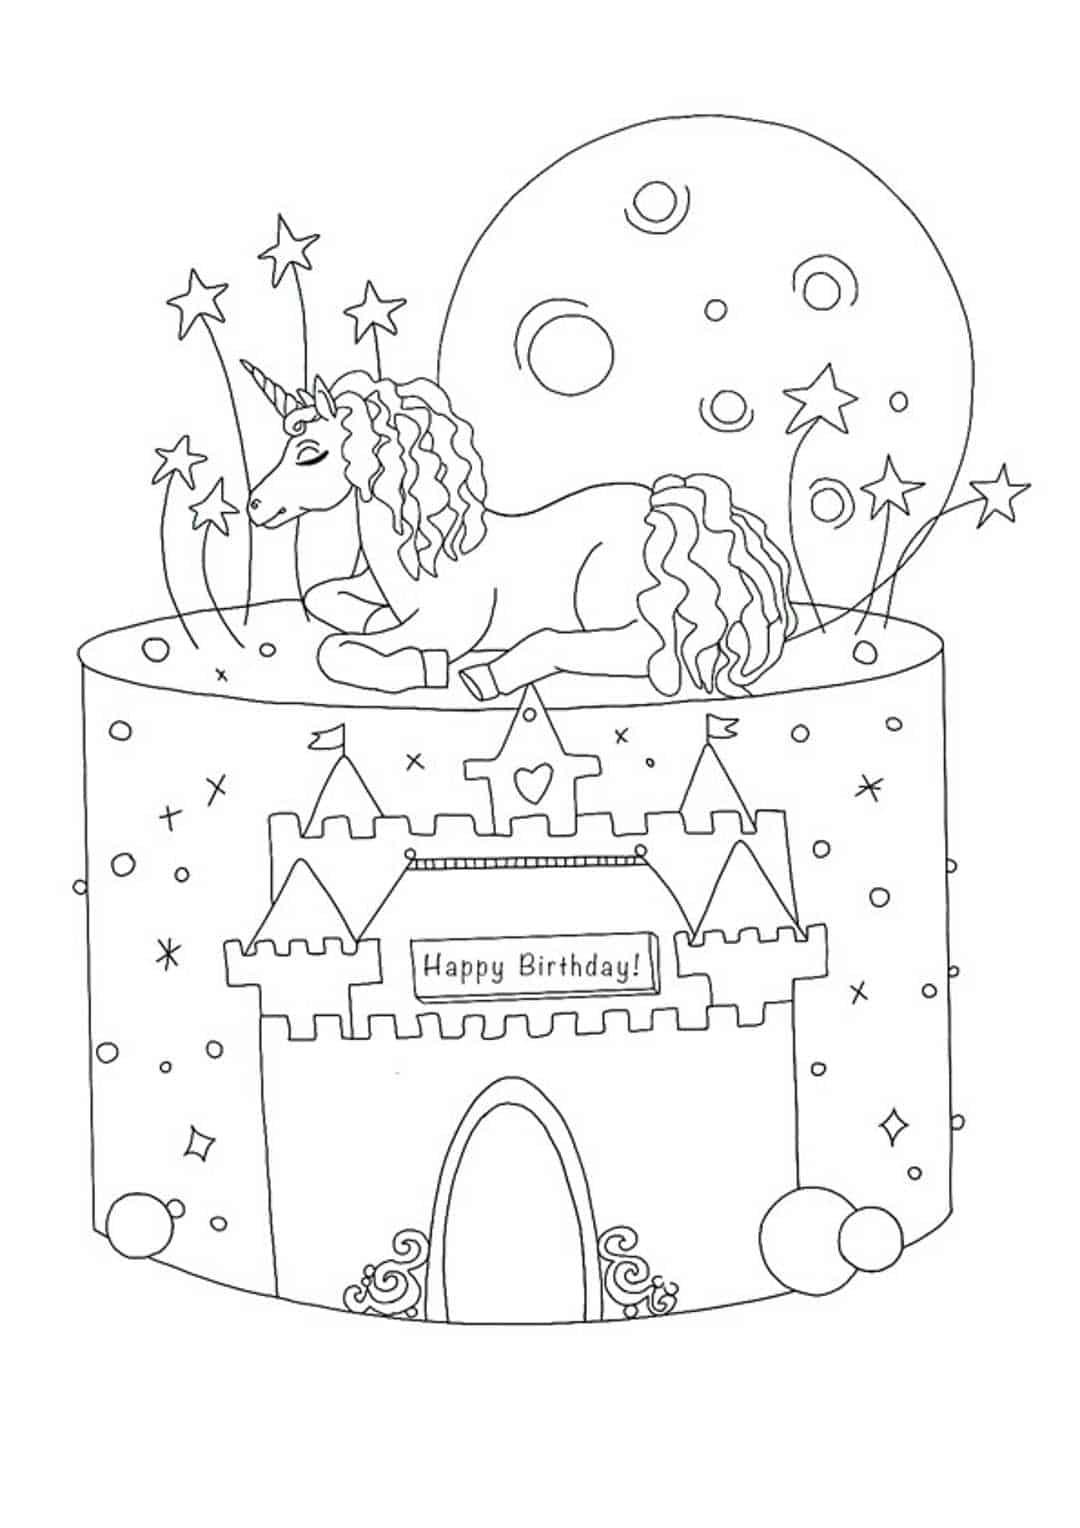 Birthday Unicorn cake coloring page